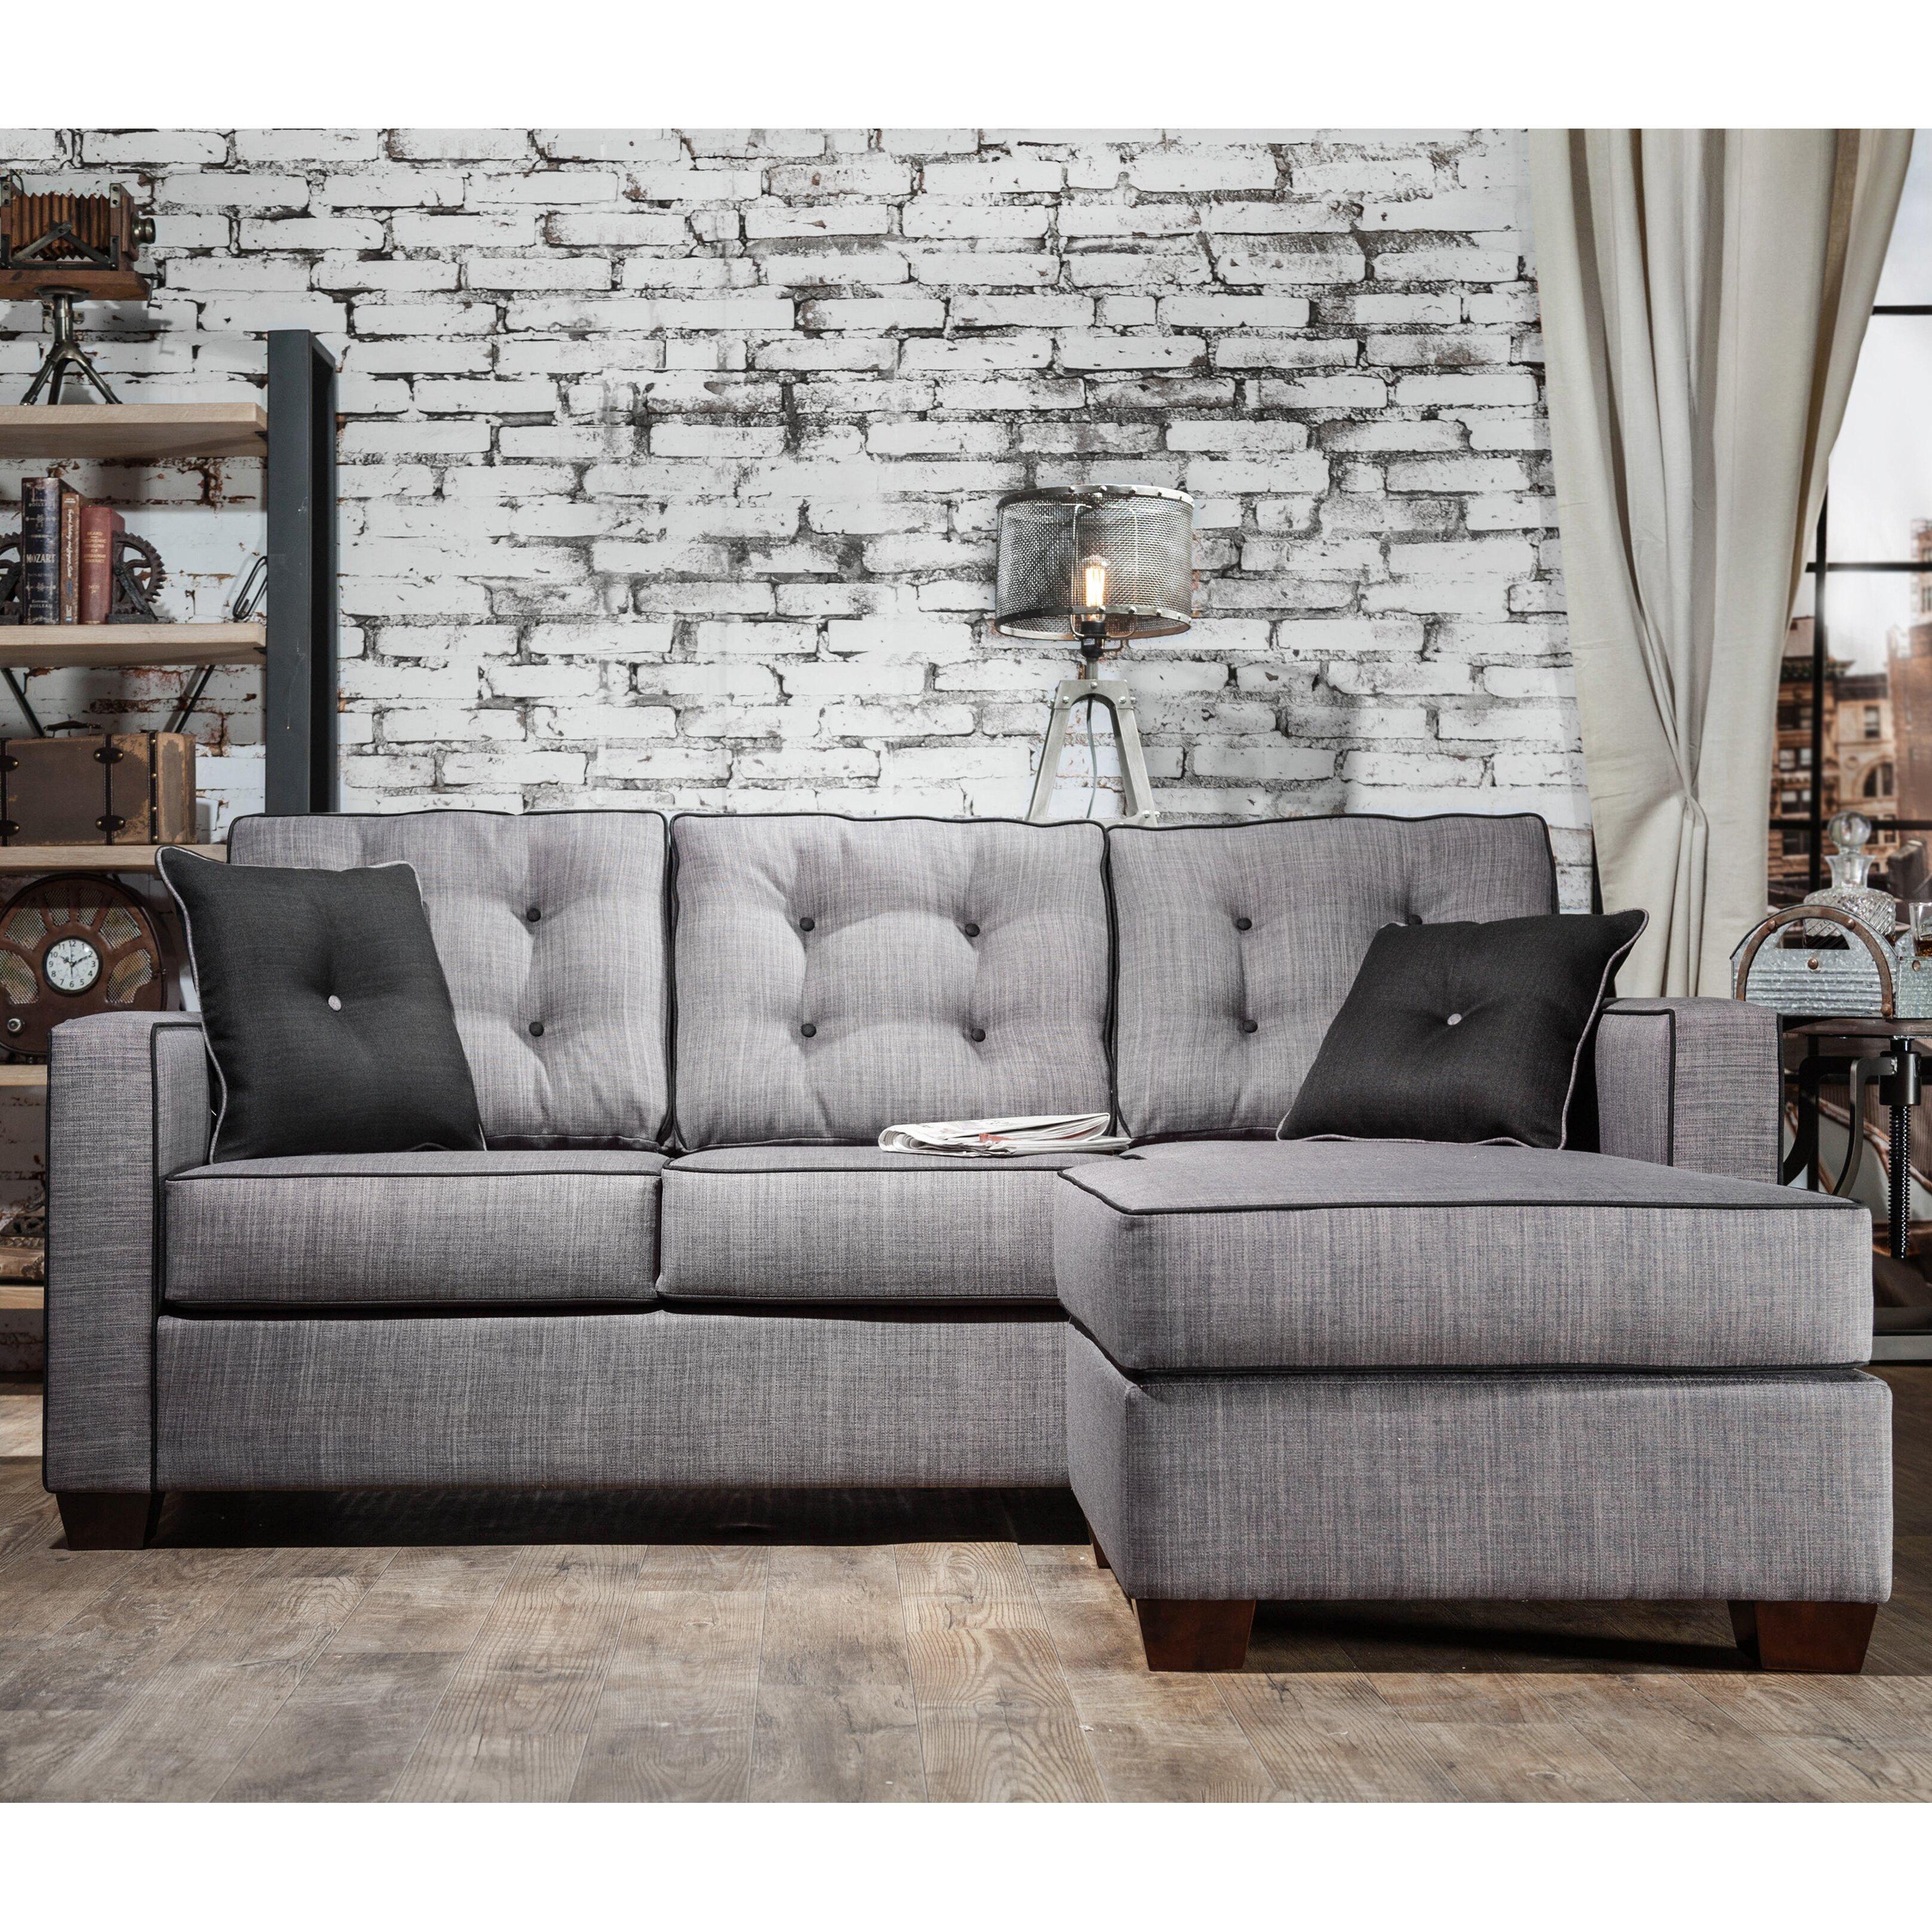 Hokku designs urban valor sectional reviews wayfair for Hokku designs living room furniture